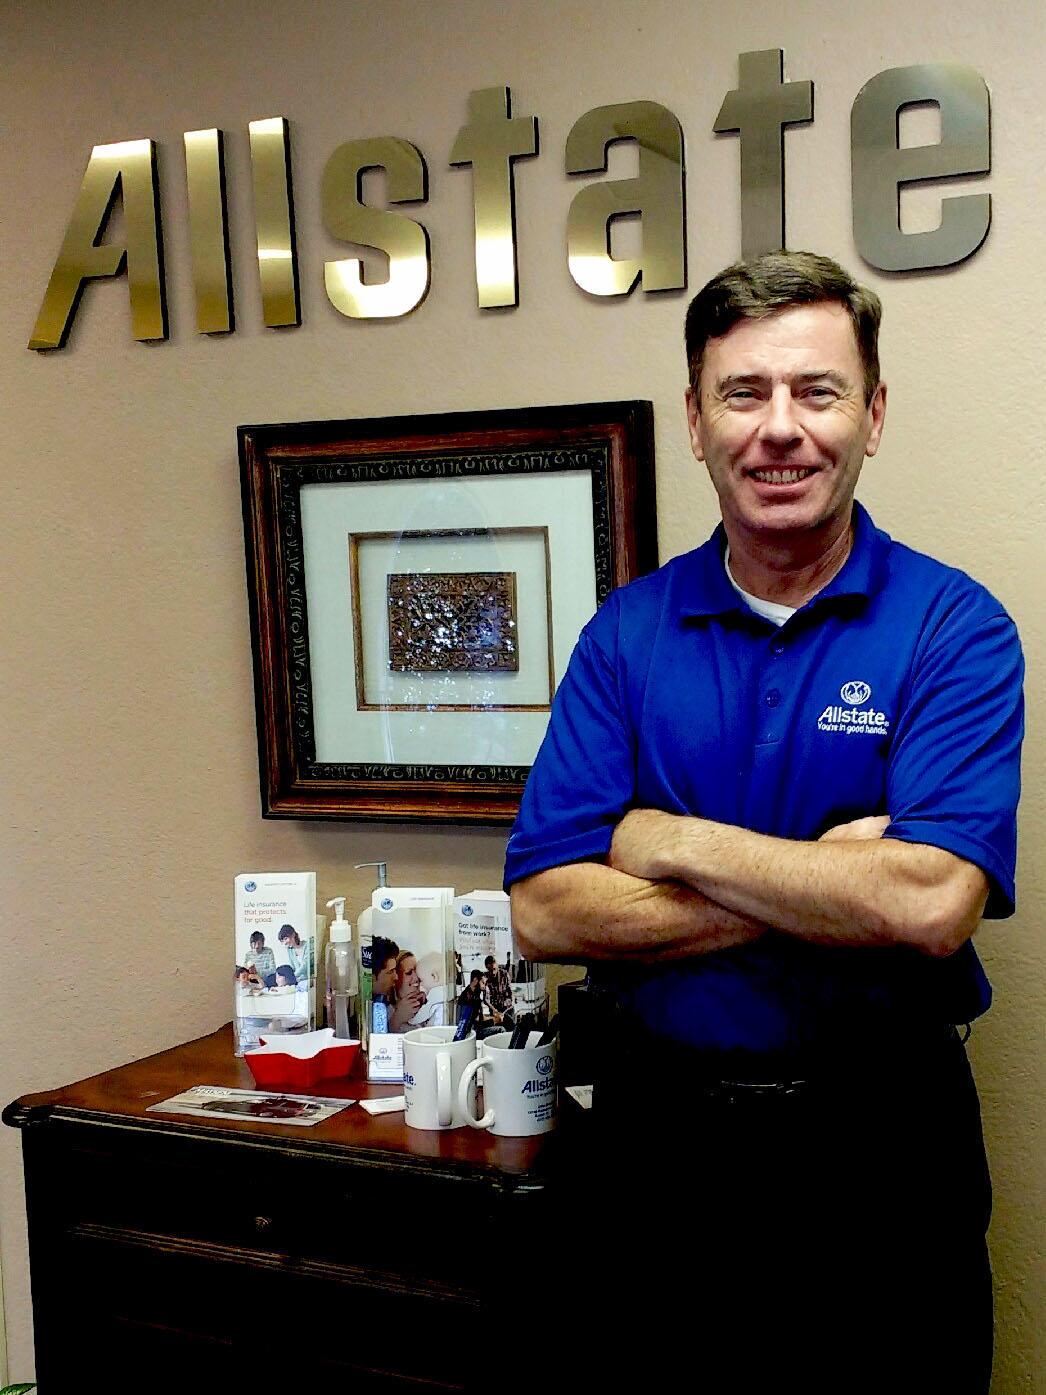 John Murphy: Allstate Insurance